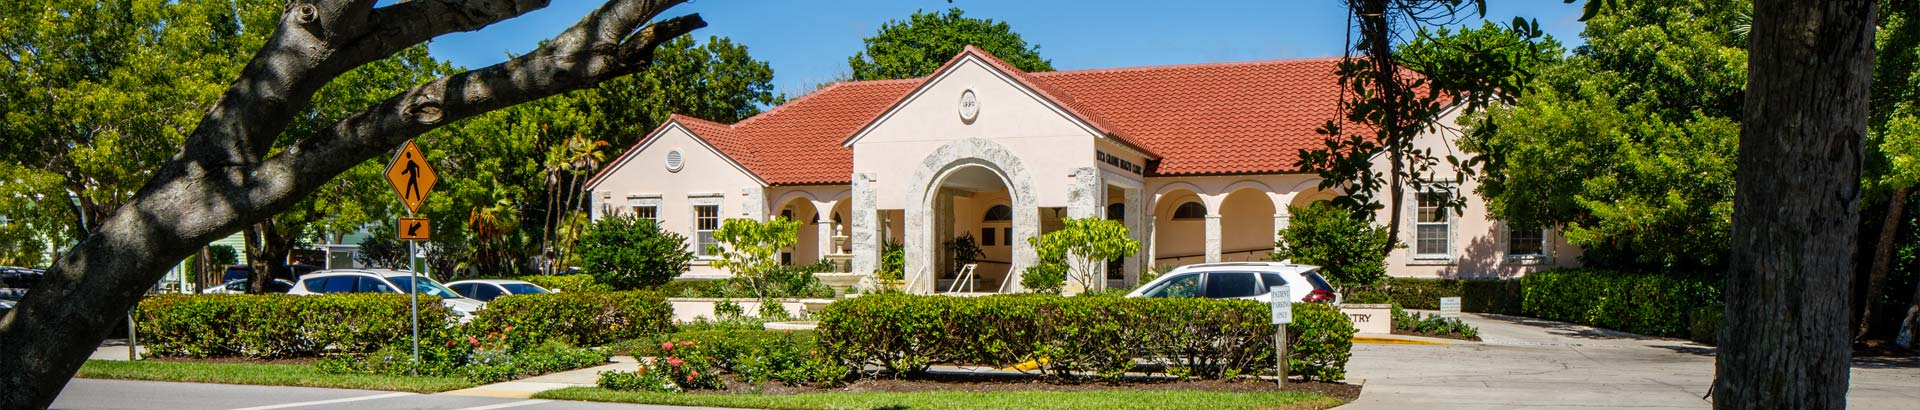 Boca Grande Health Clinic Building Frontal View